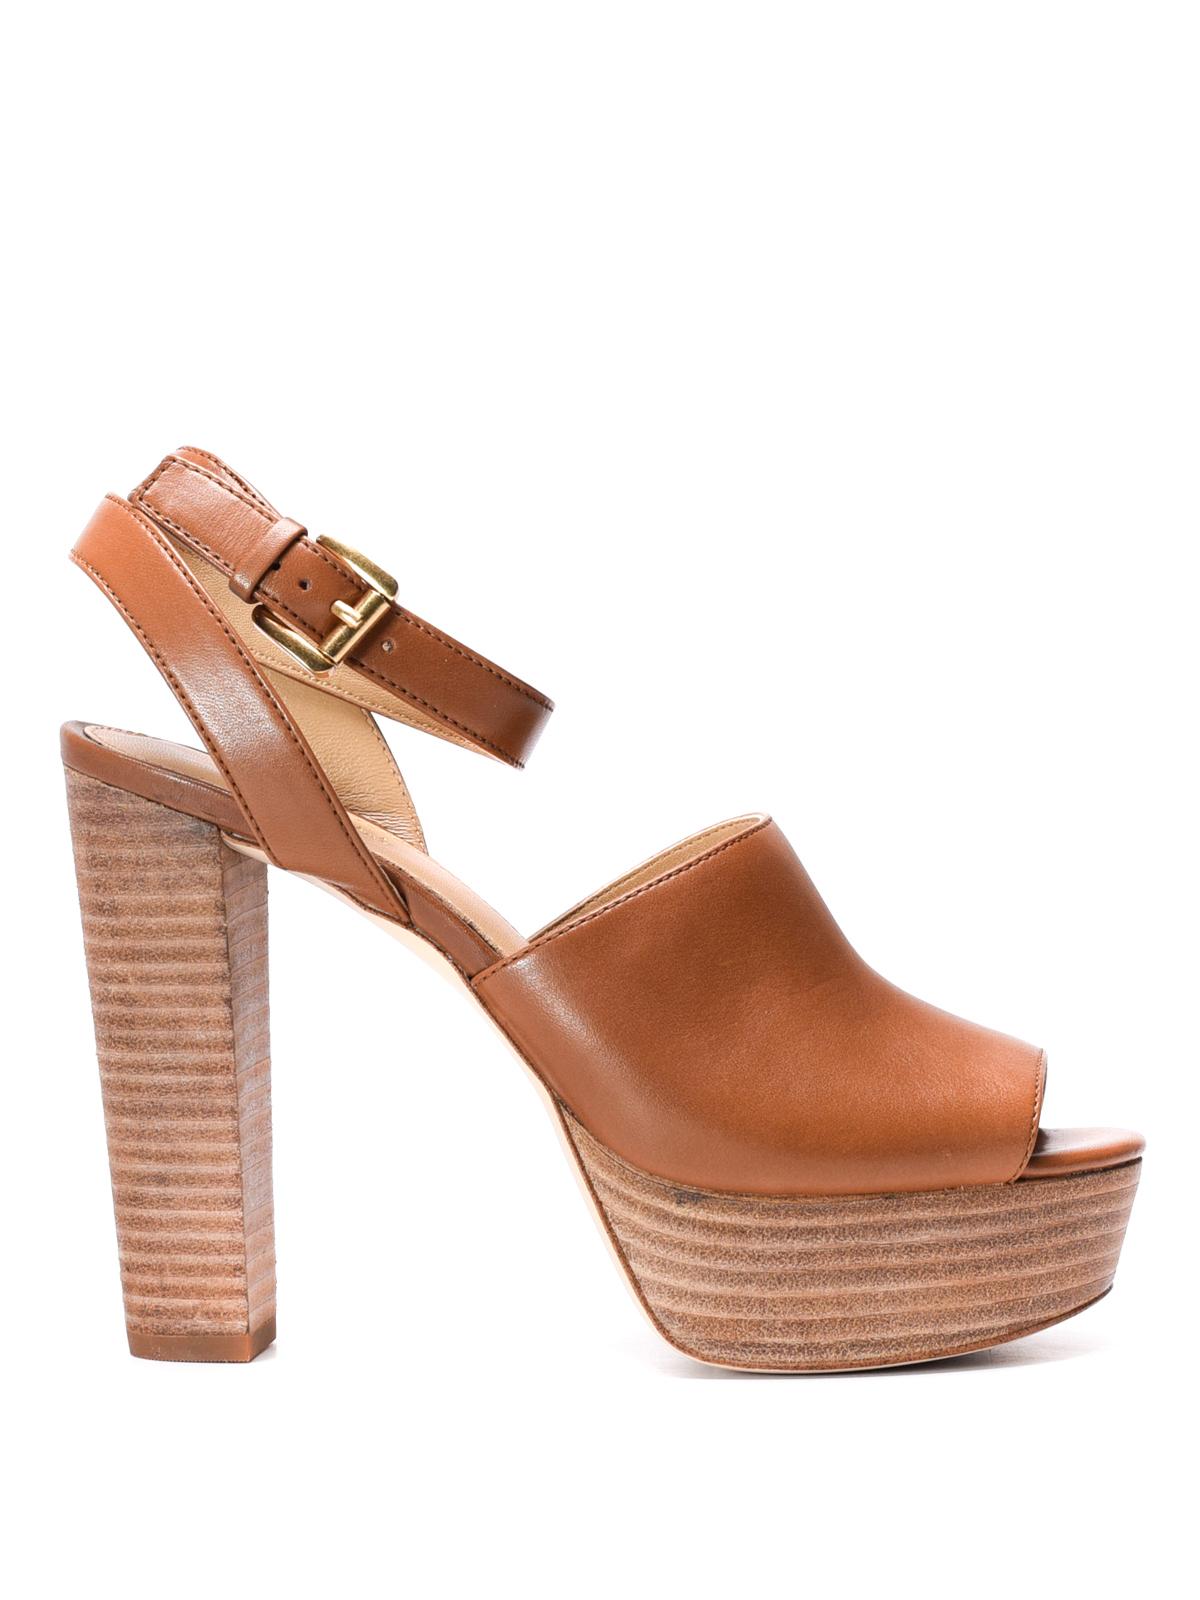 f0659fed713d Michael Kors - Trina platform leather sandals - sandals - 40R7TNMS1L